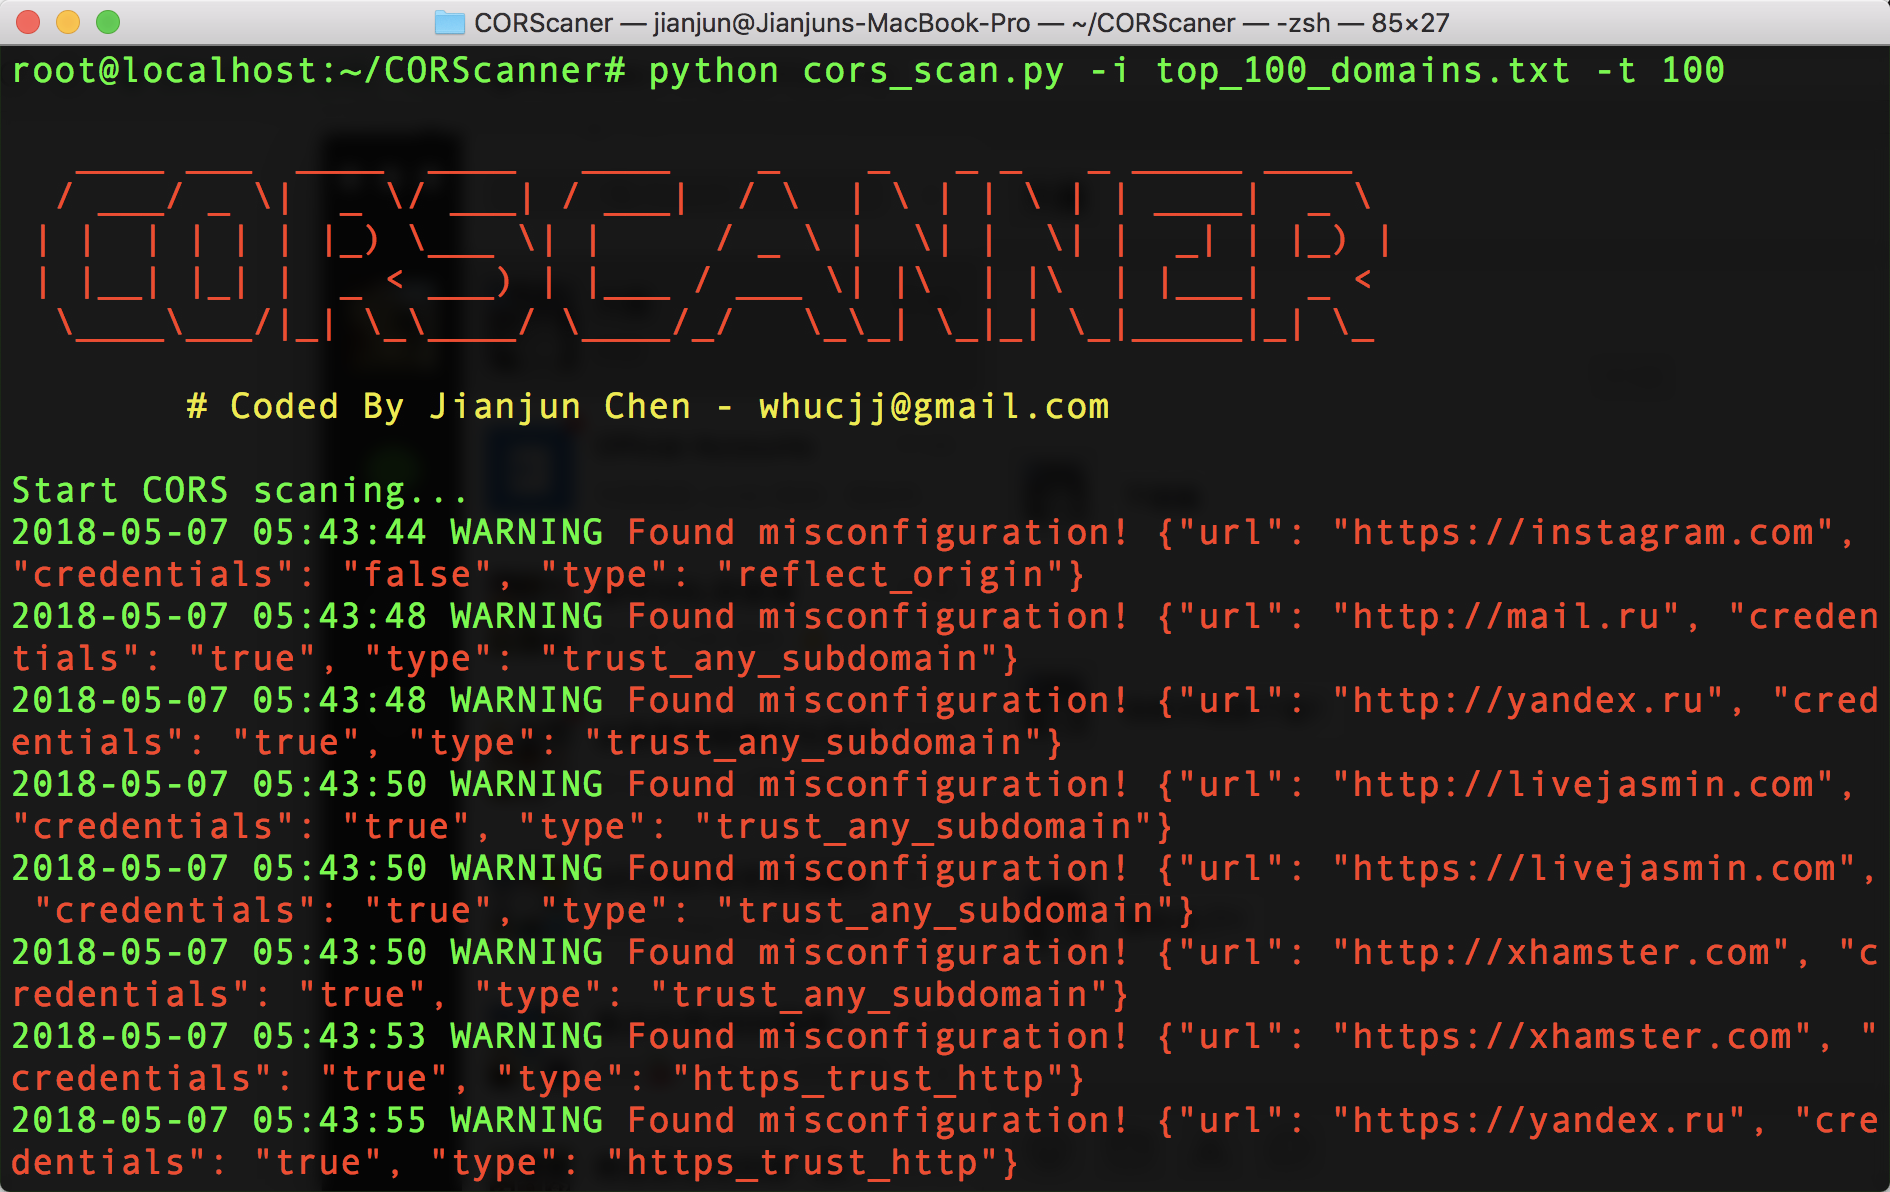 CORScanner